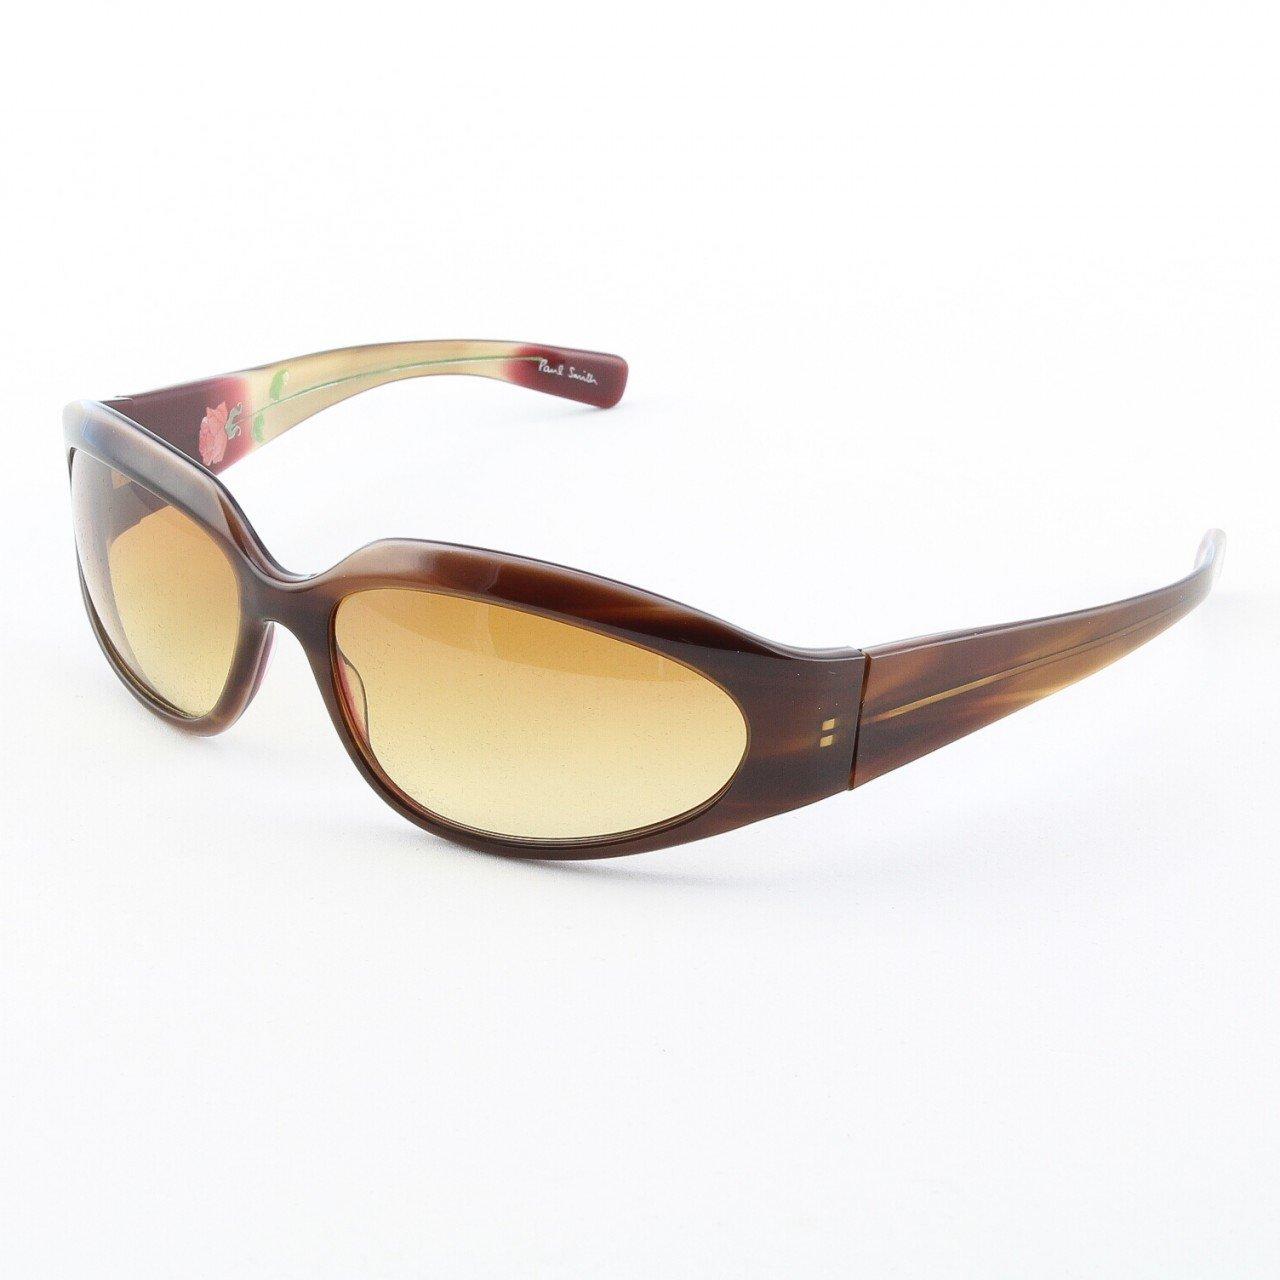 Paul Smith PS-347 SYGA Sunglasses Light Tortoise Brown w/ Brown Gradient Lenses 64mm